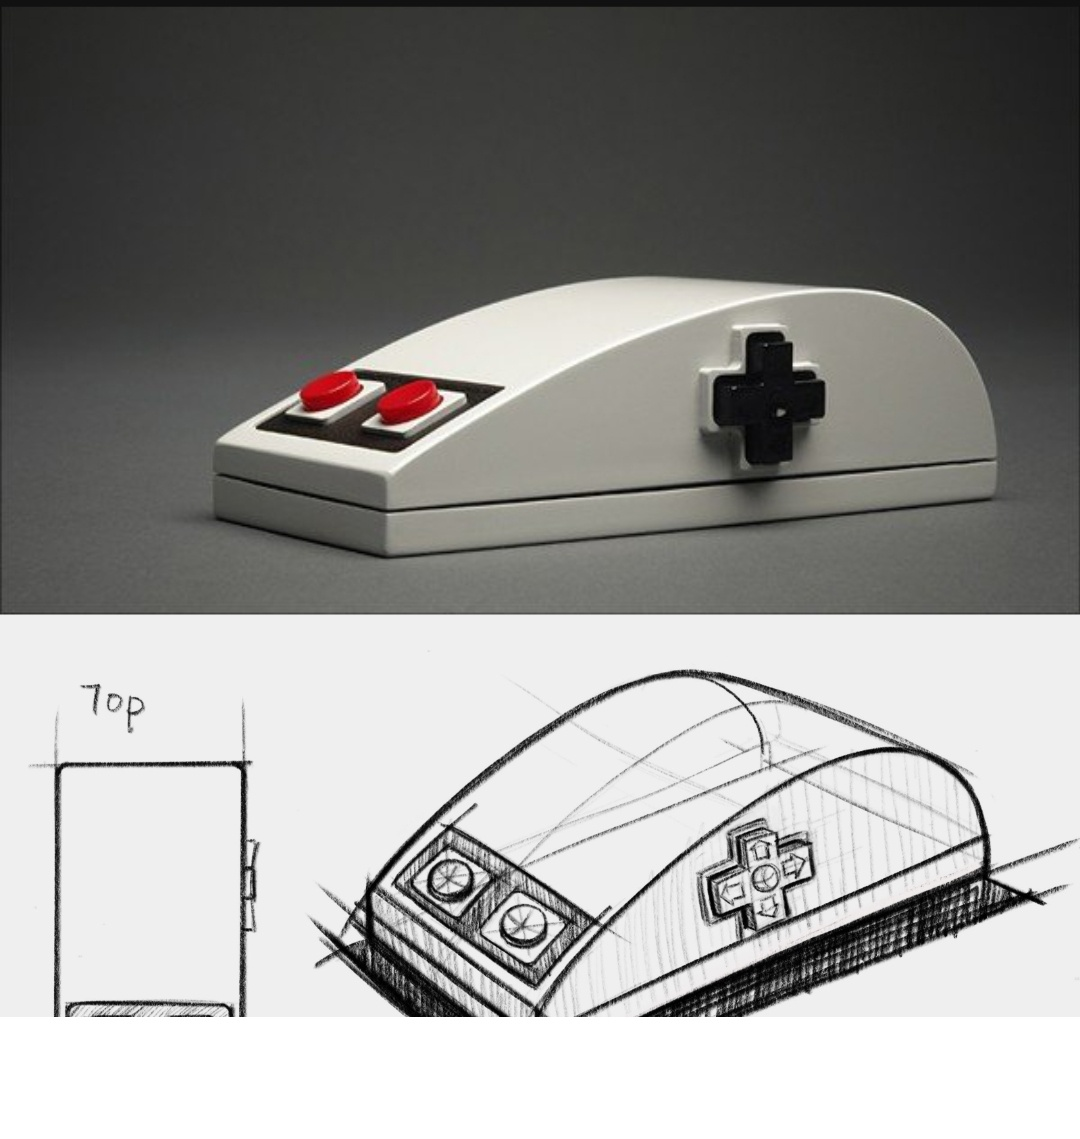 8Bitdo-Mouse-Belchine-2